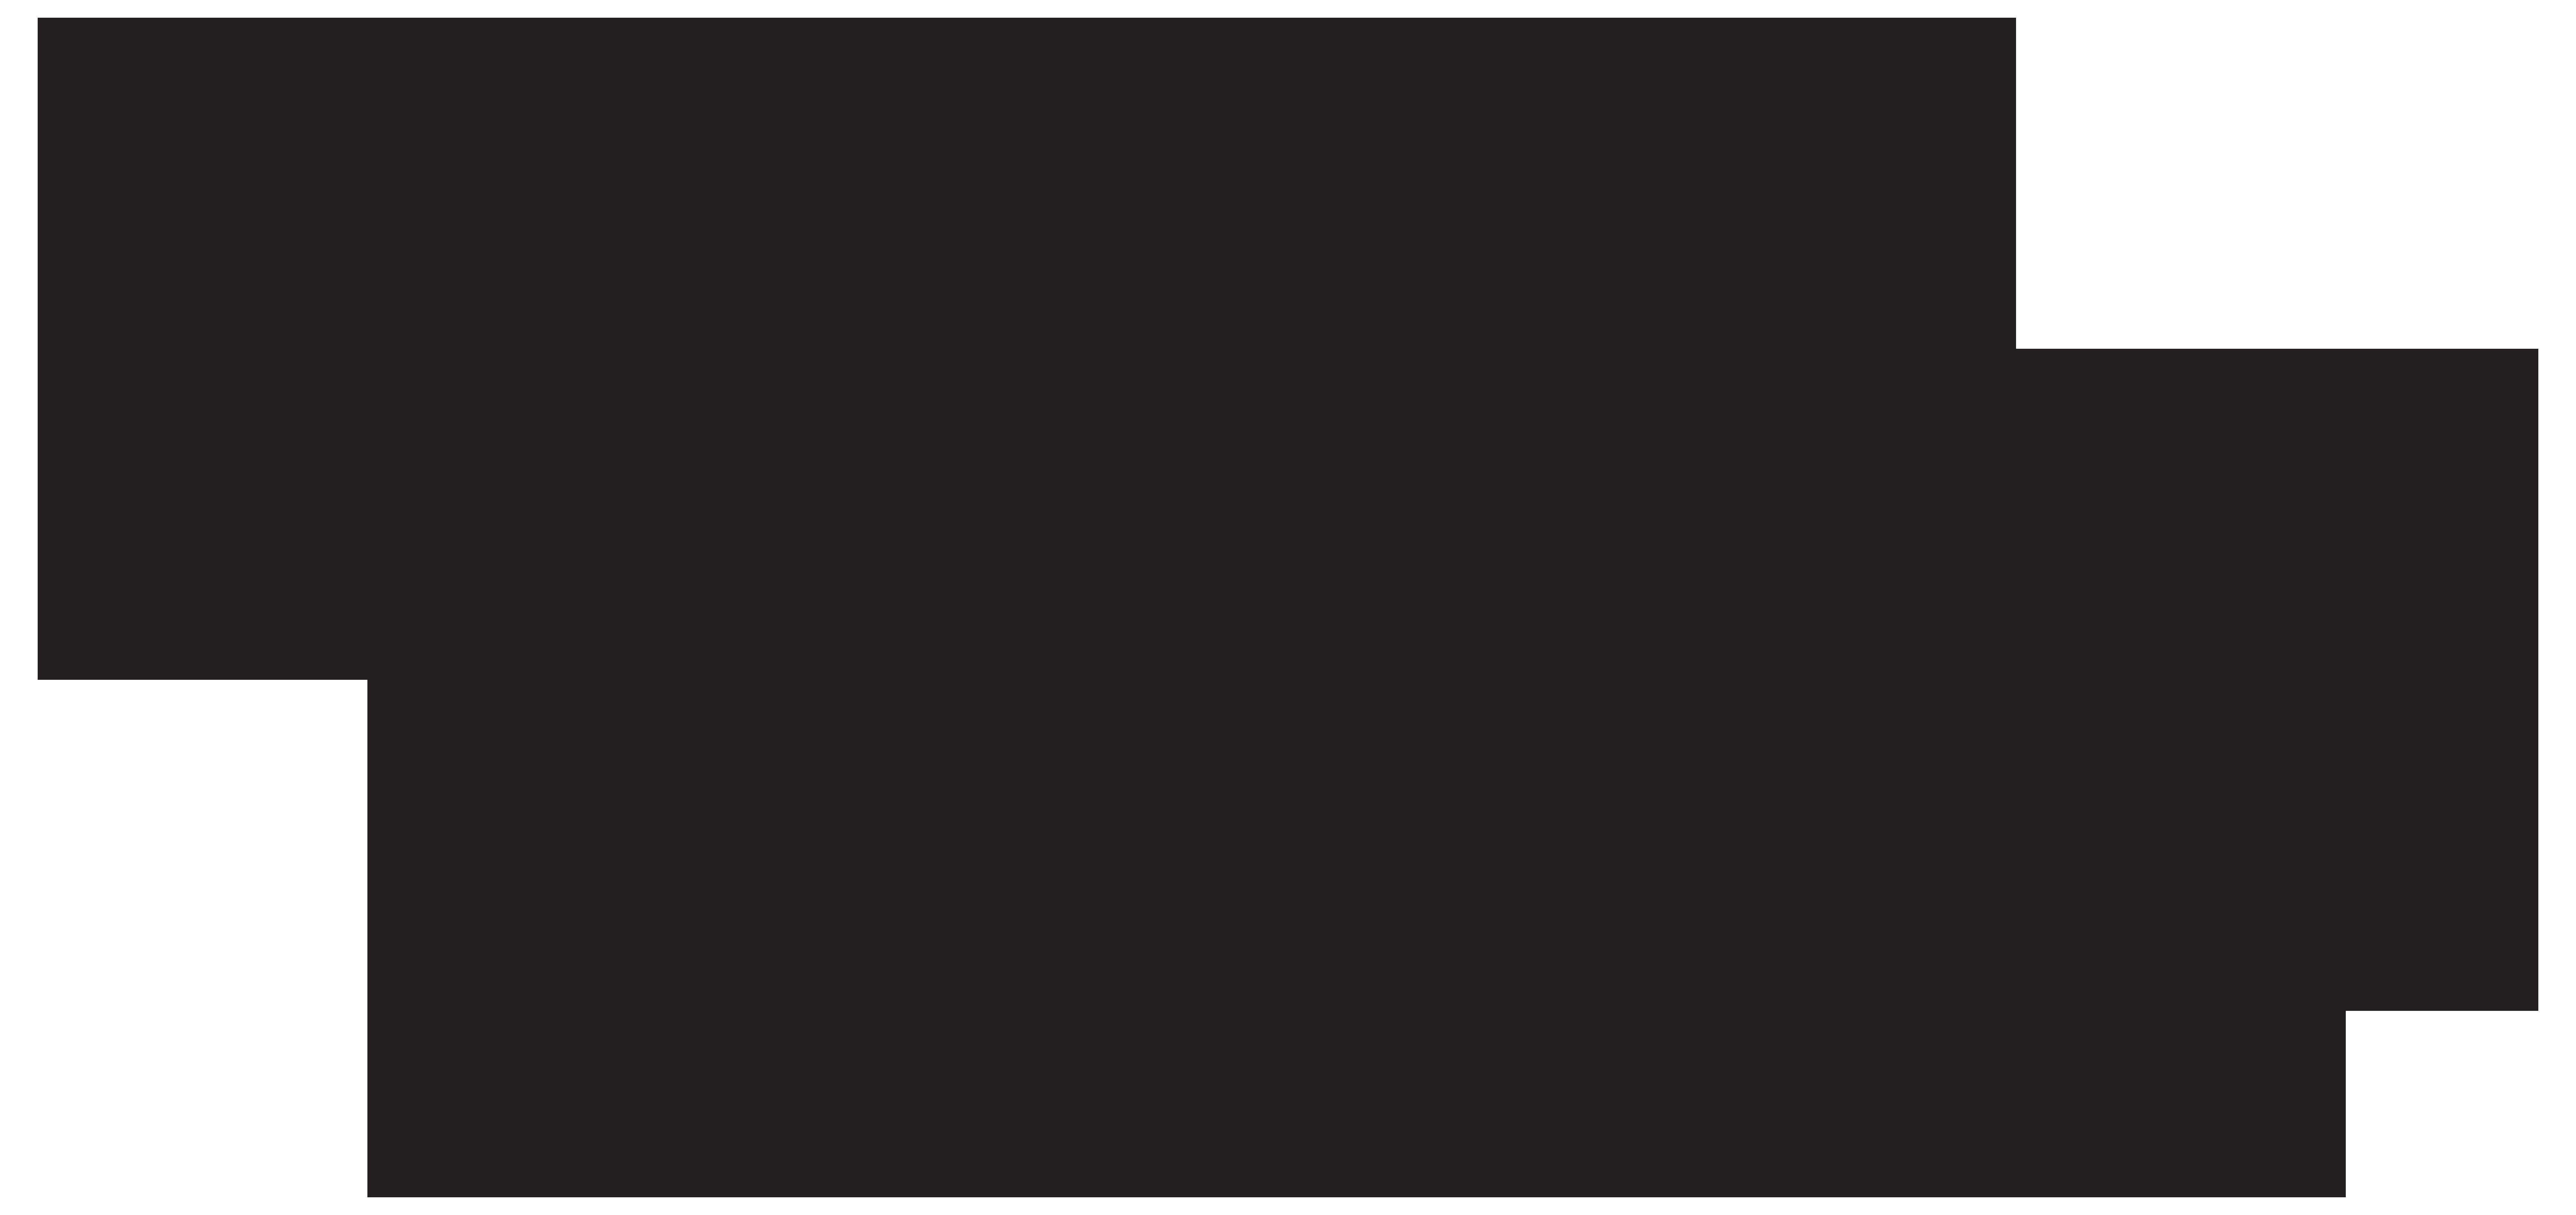 Jaguar Silhouette Clip Art.